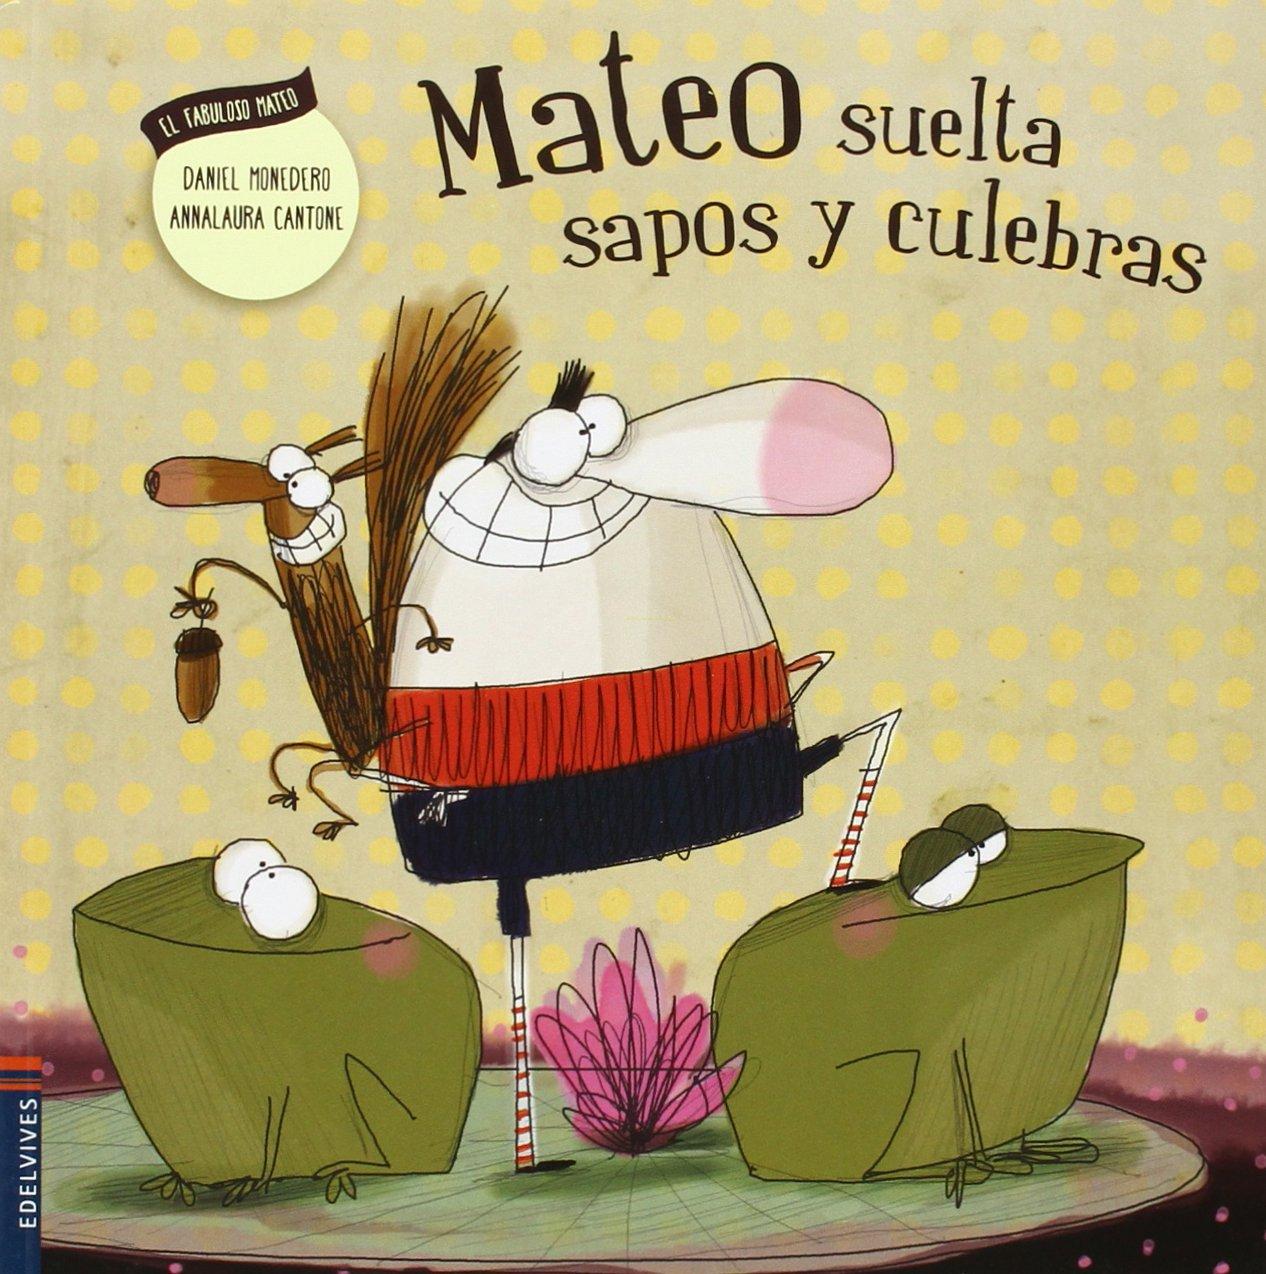 Mateo suelta sapos y culebras (El fabuloso Mateo) Tapa blanda – 11 feb 2015 Daniel Monedero Alonso Annalaura Cantone Edelvives 8426398529